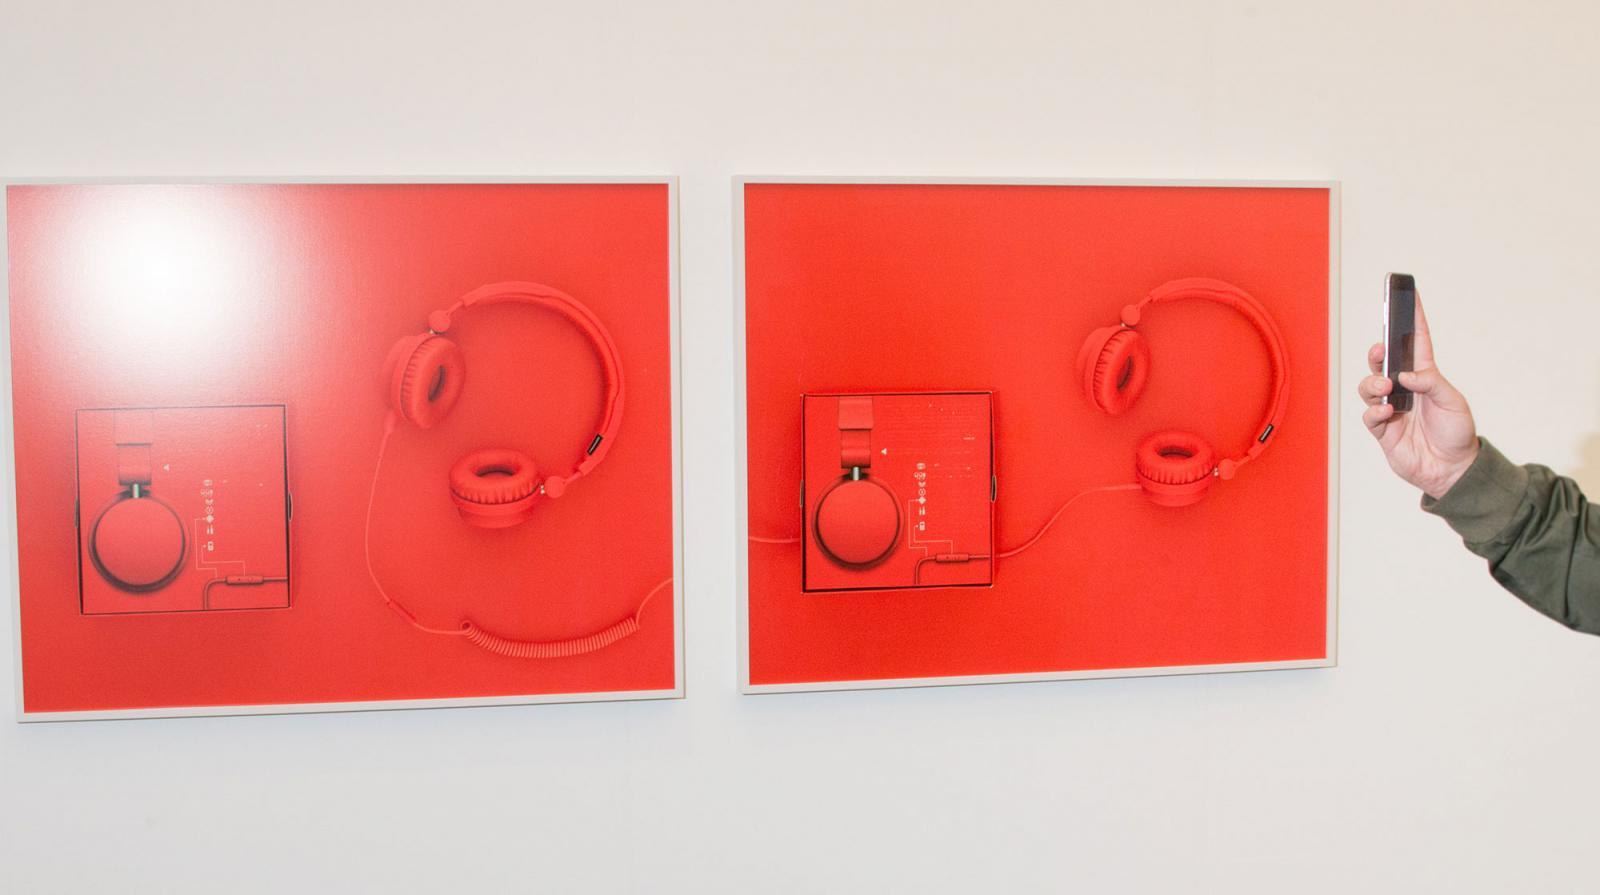 Natalie Czech at Galerie Kadel Willborn